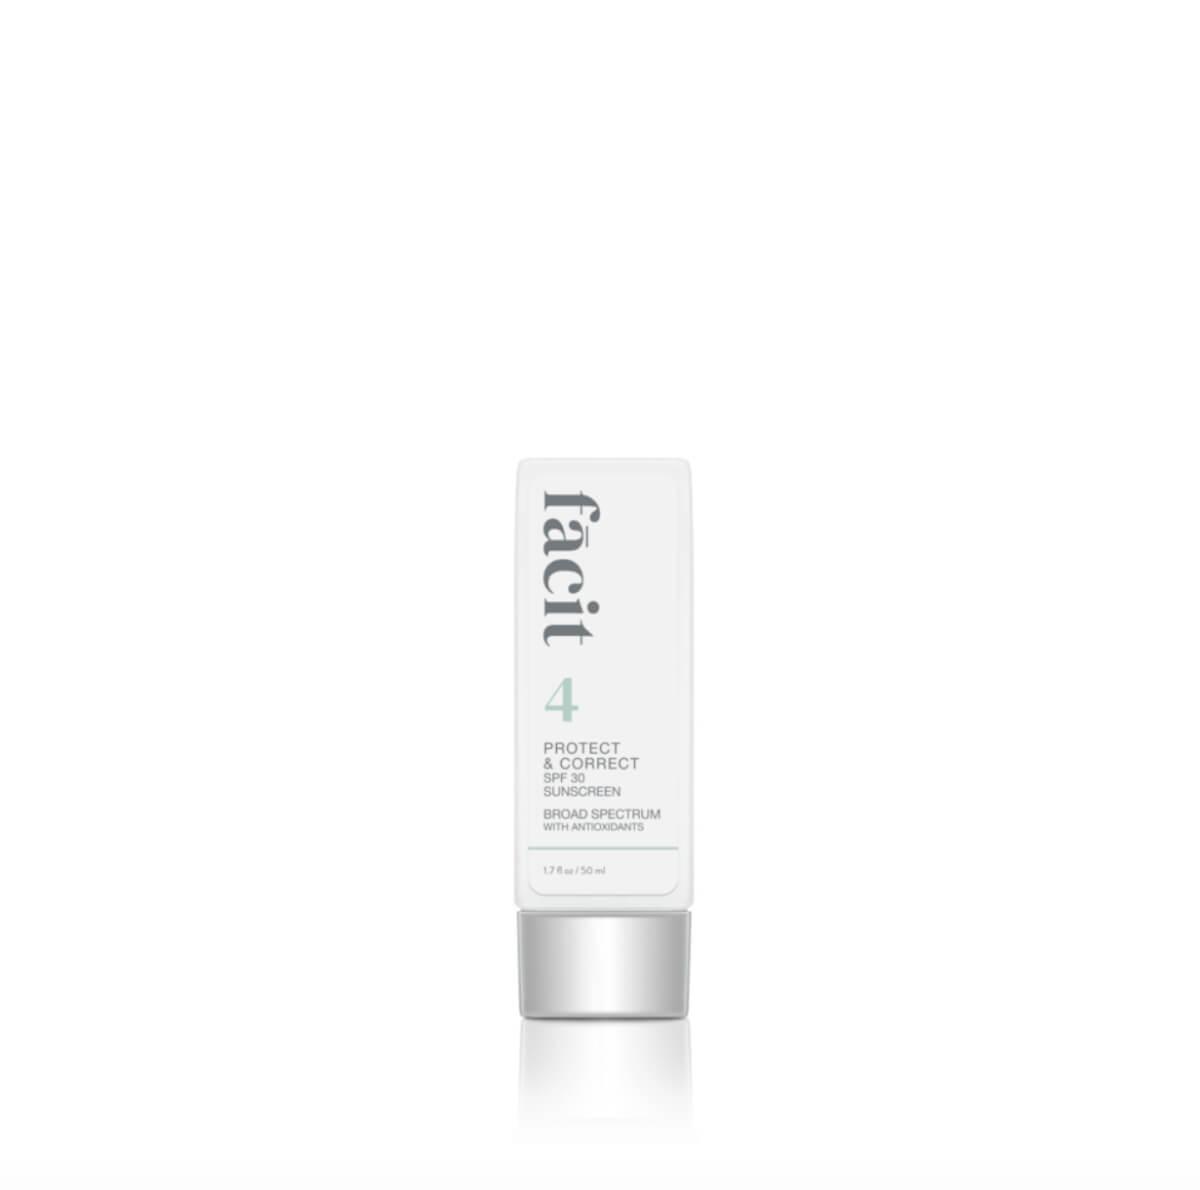 protect-and-correct-spf-30-sunscreen-facit-050421